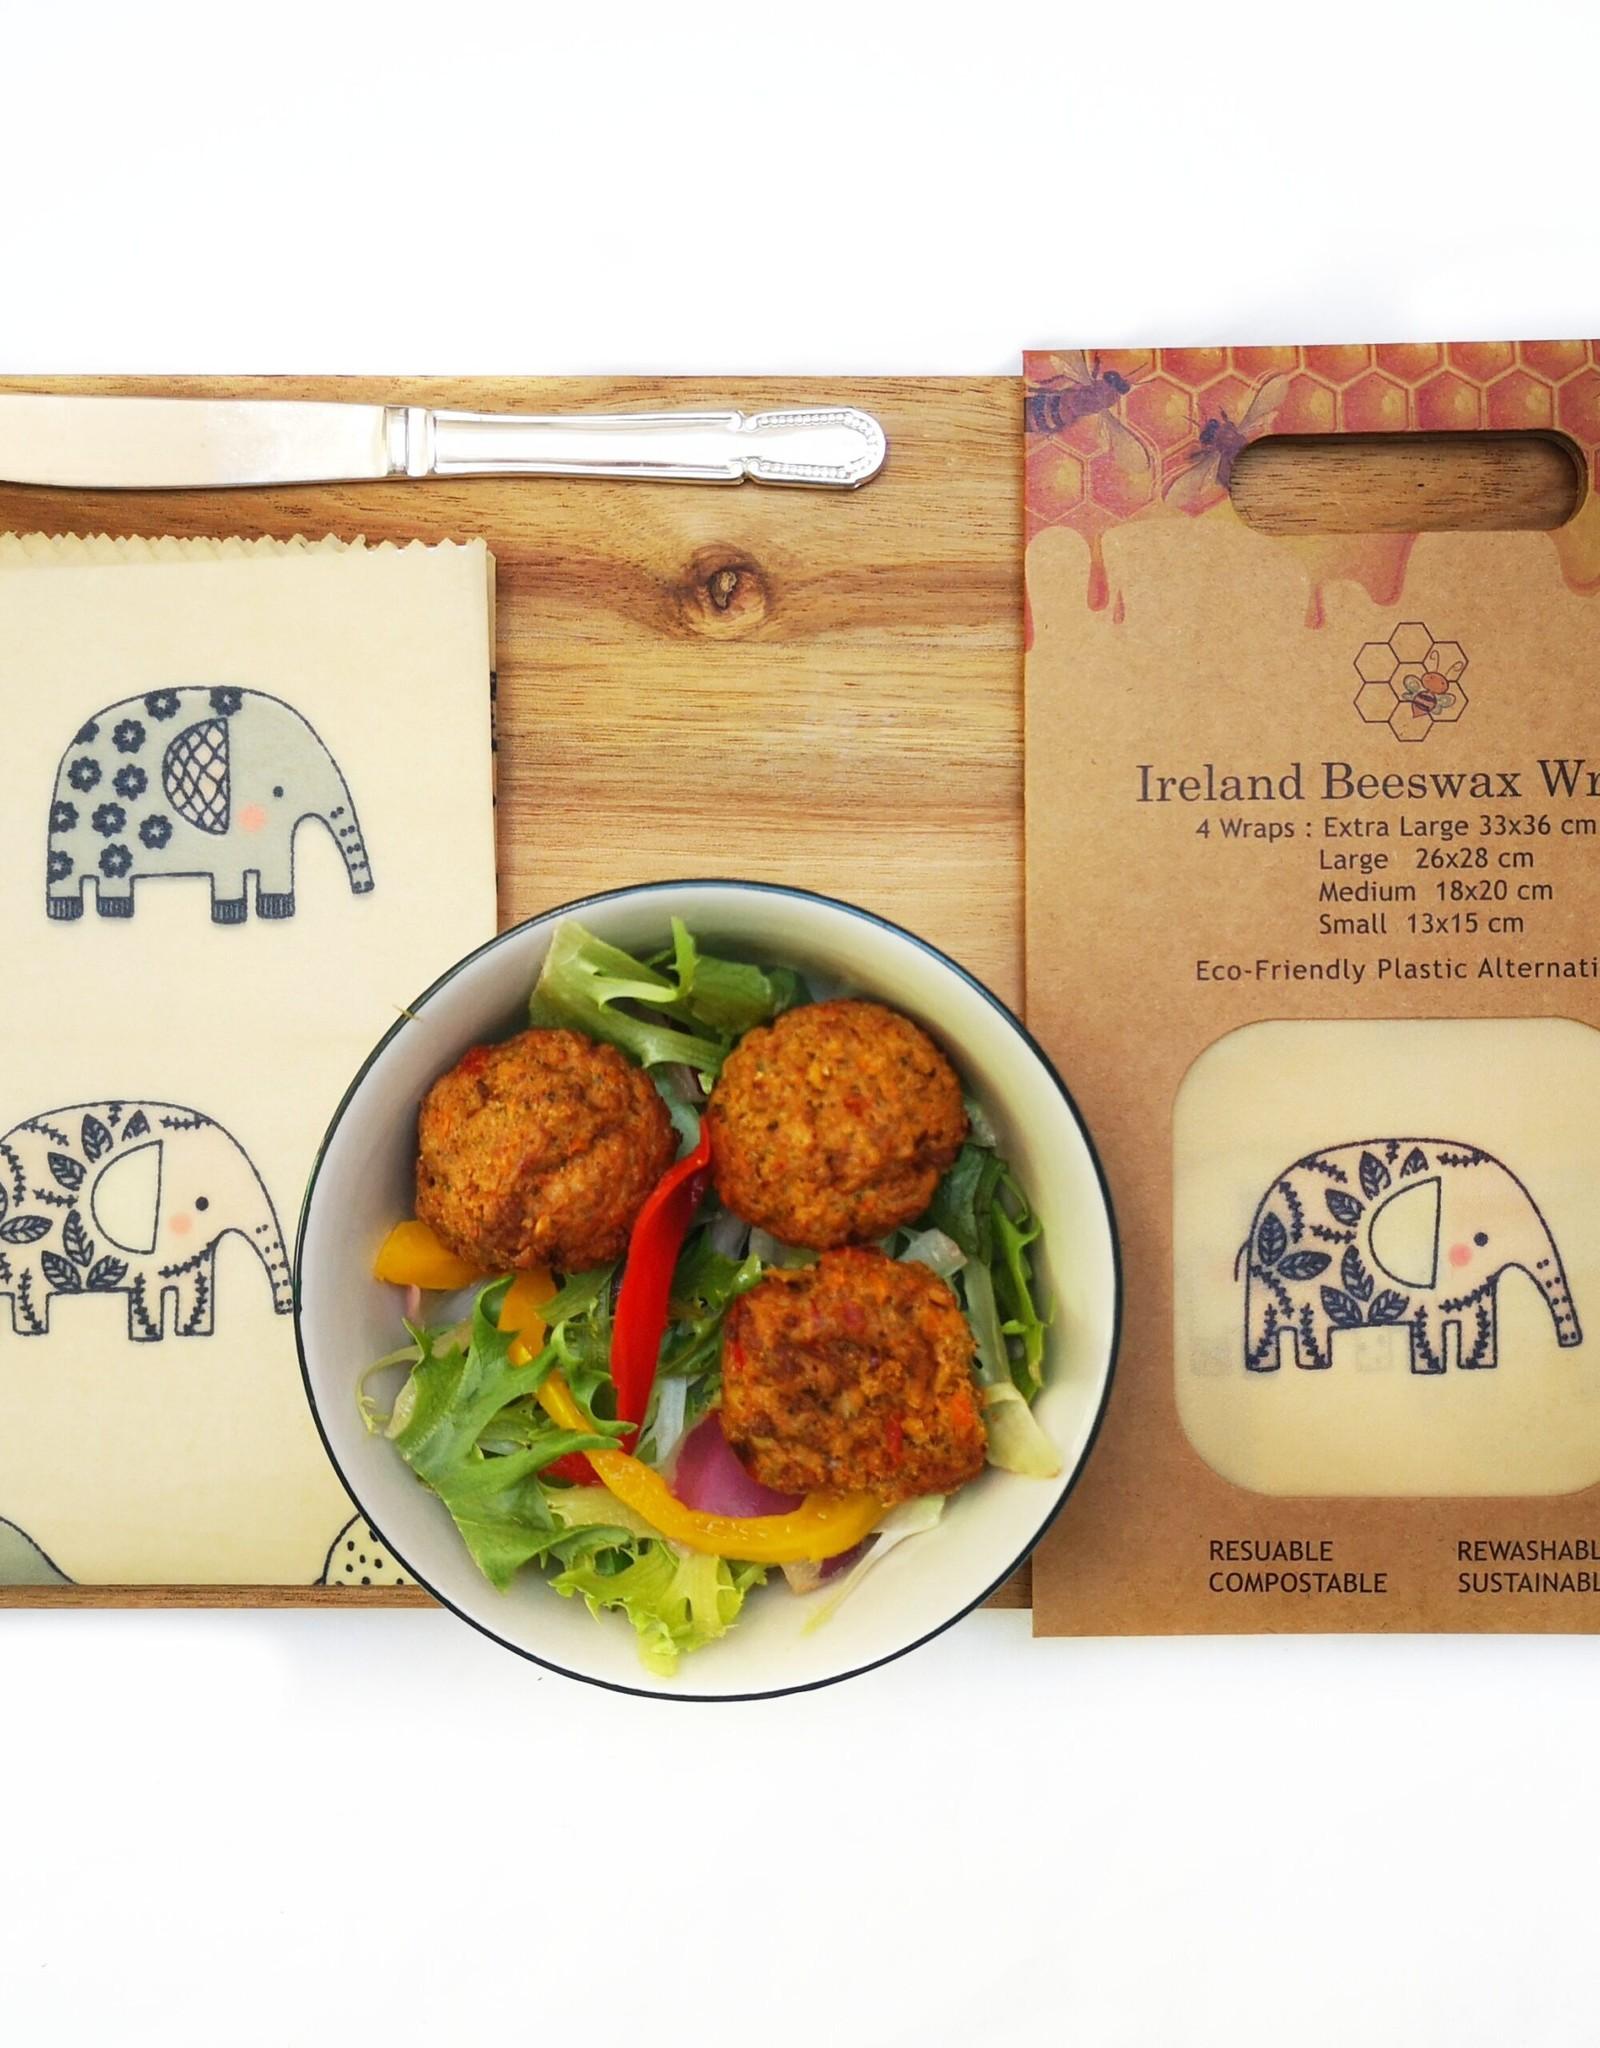 Ireland Beeswax Wraps Ireland Beeswax Wraps 4 pack